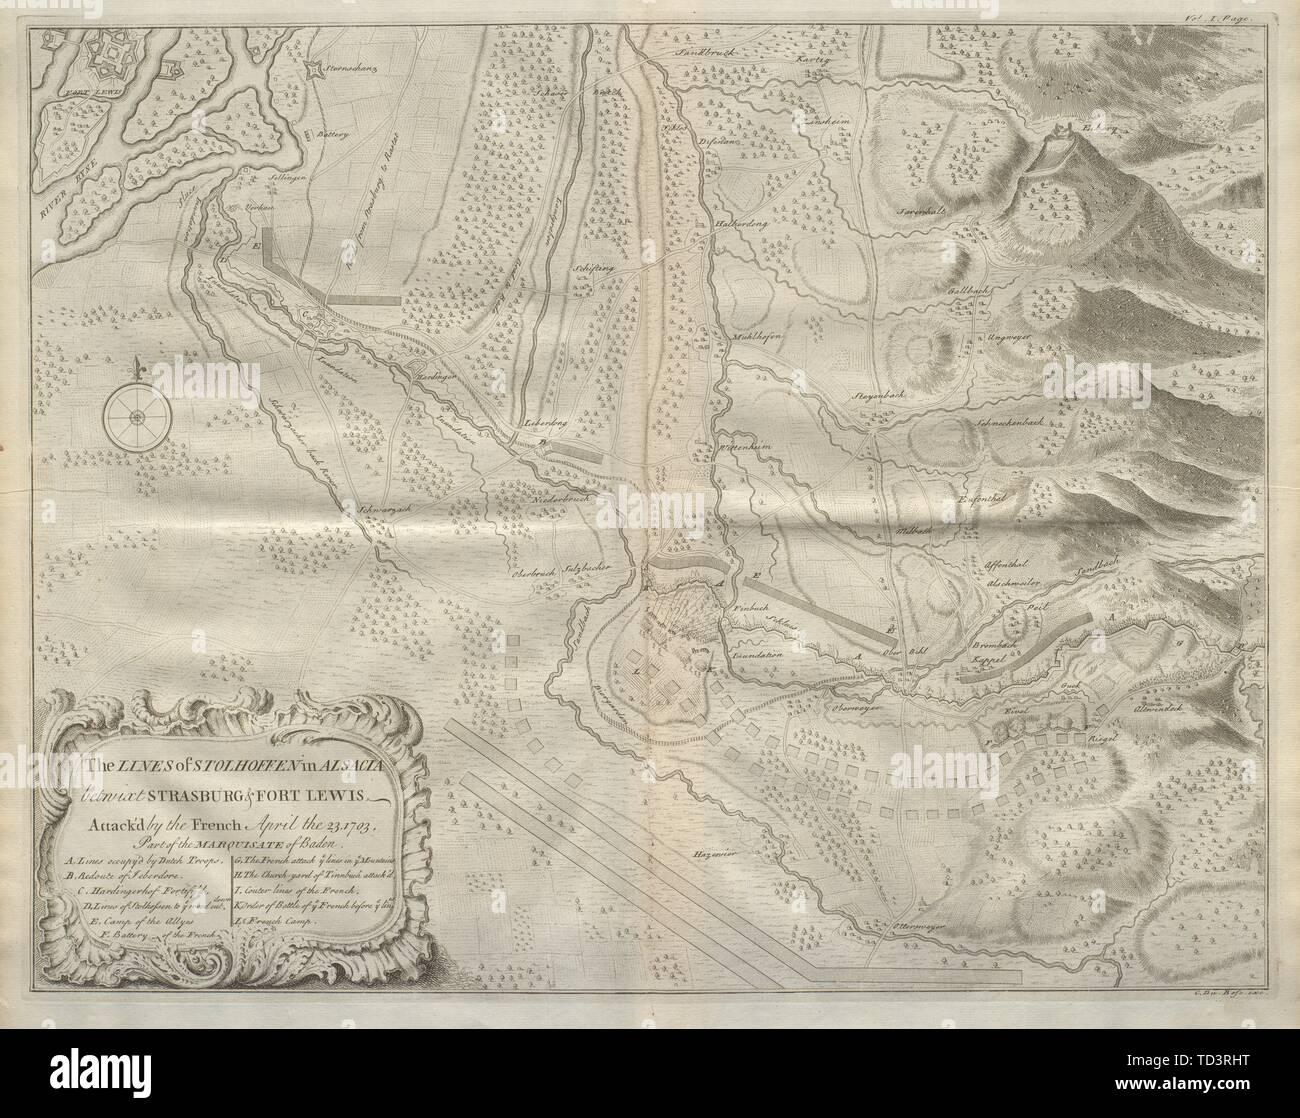 The Lines of Stolhoffen… 1703. Stollhofen, Baden-Württemberg. DU BOSC 1736 map - Stock Image